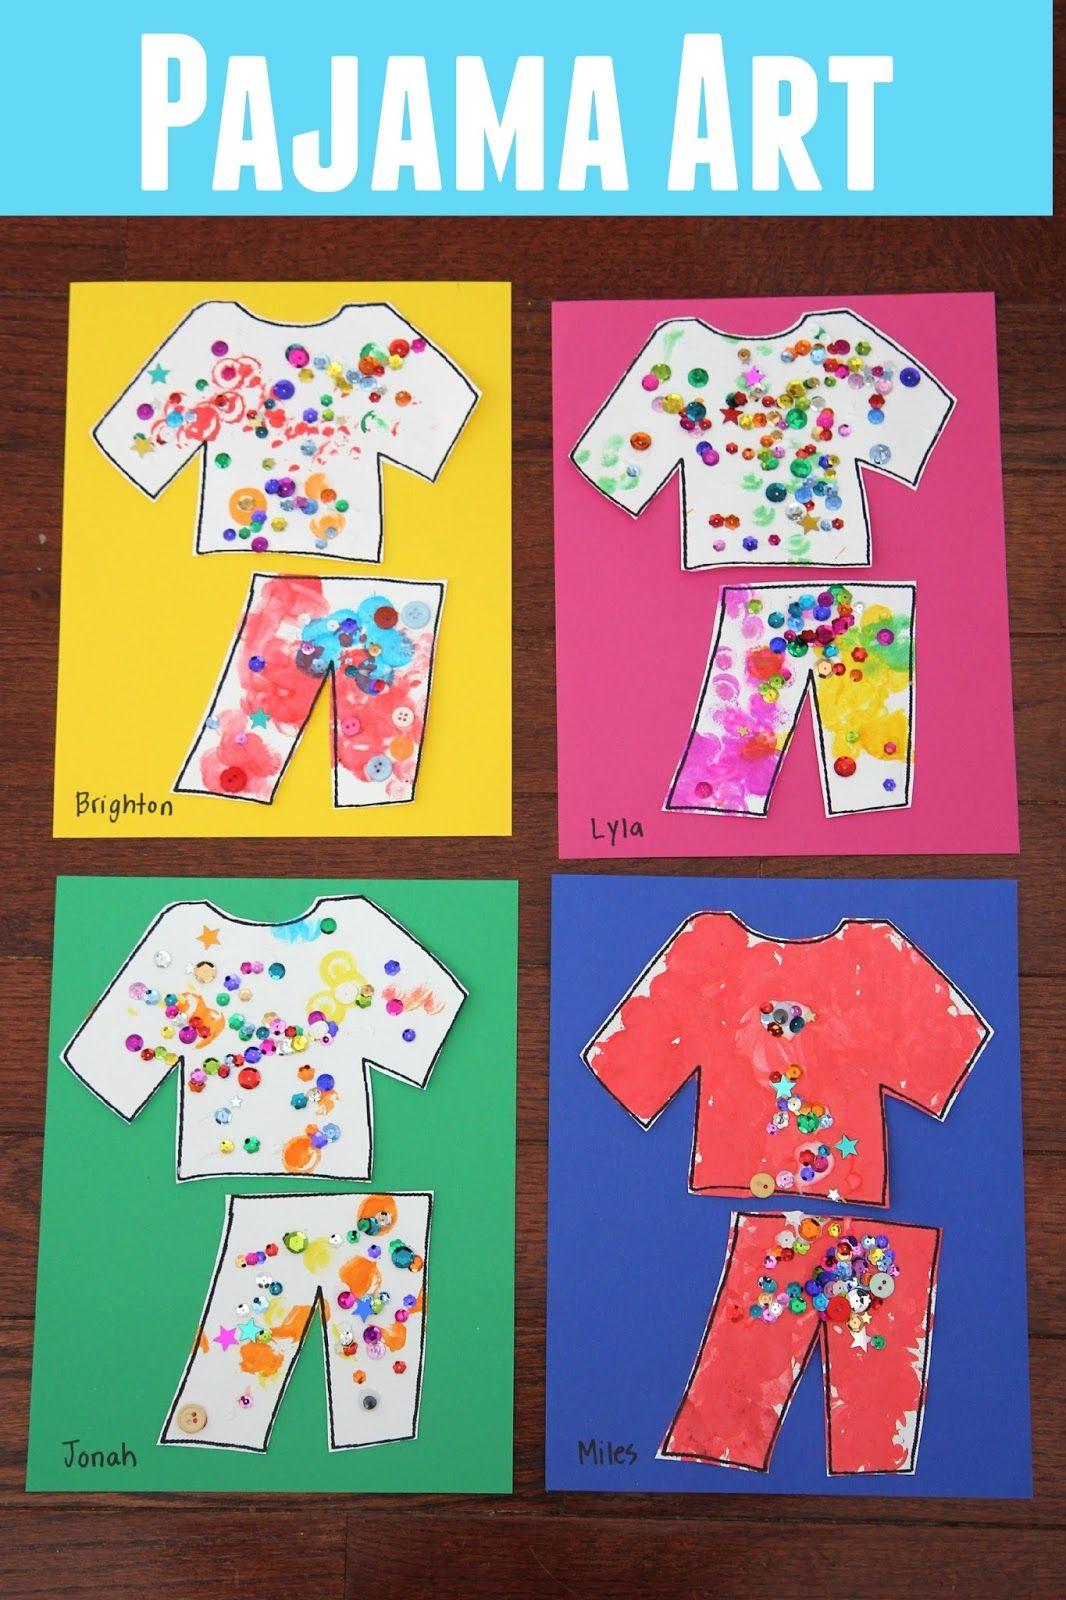 pajama name matching activity for kids llama llama red pajama